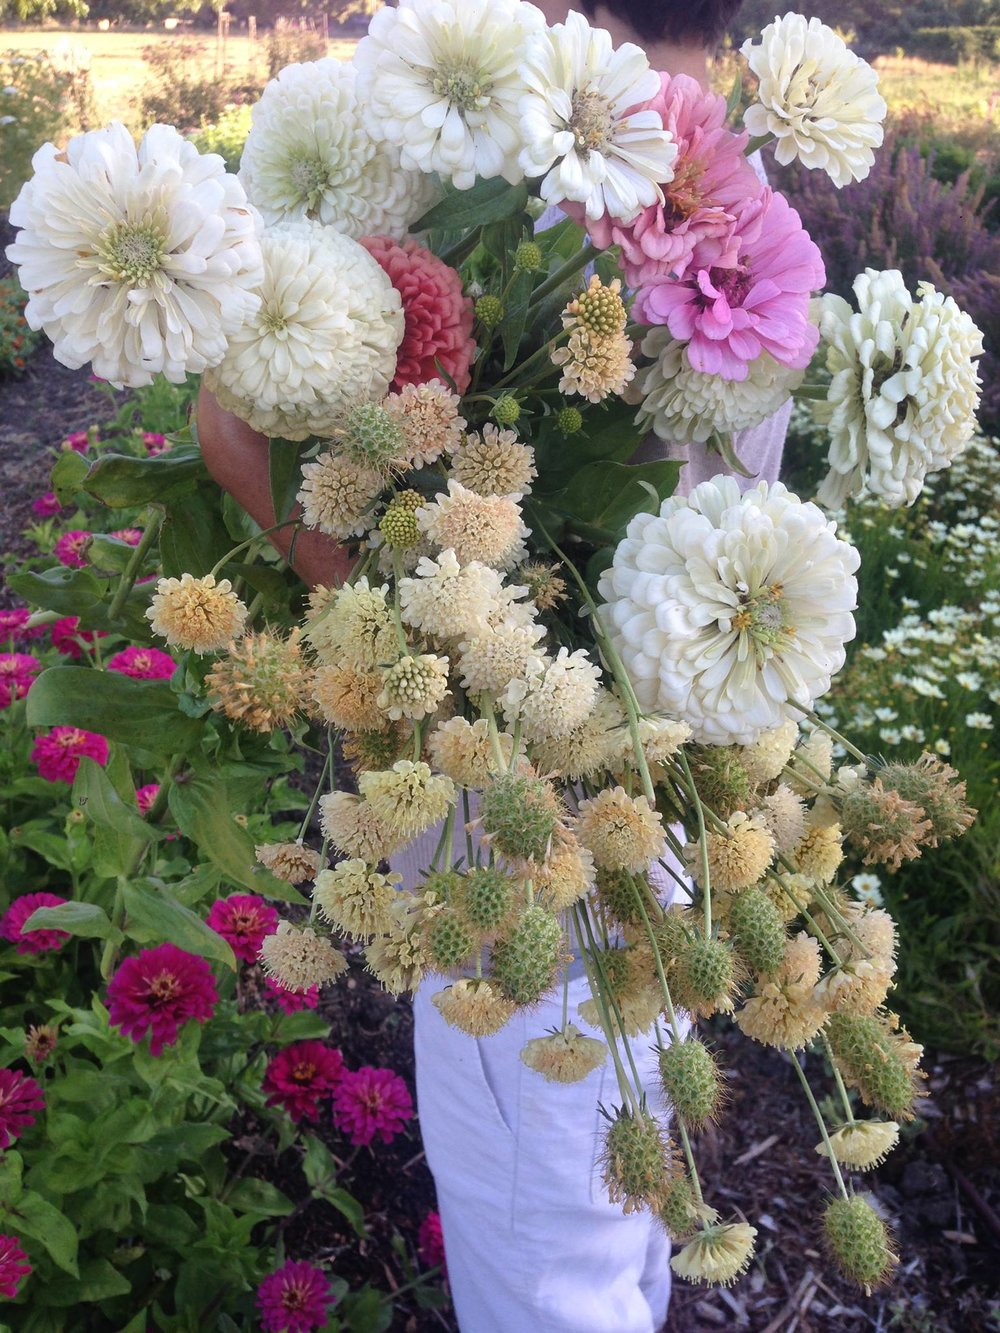 sff flowers 3.jpg